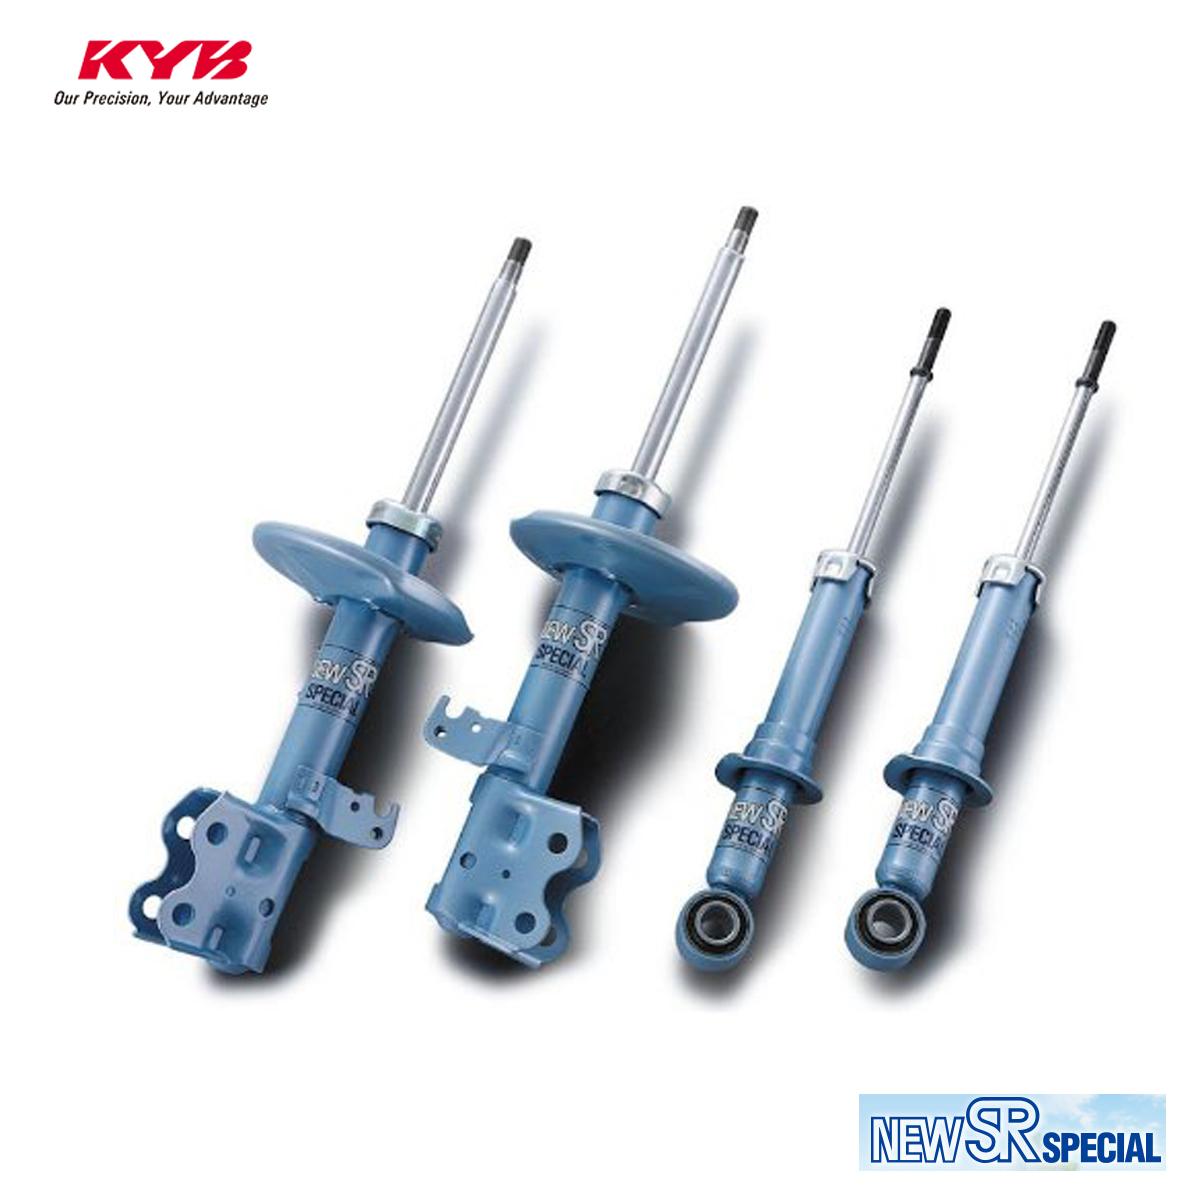 KYB カヤバ エスティマTL ACR55W ショックアブソーバー 1台分 ニュー SRスペシャル セット NEW SR SPECIAL NS-53272090